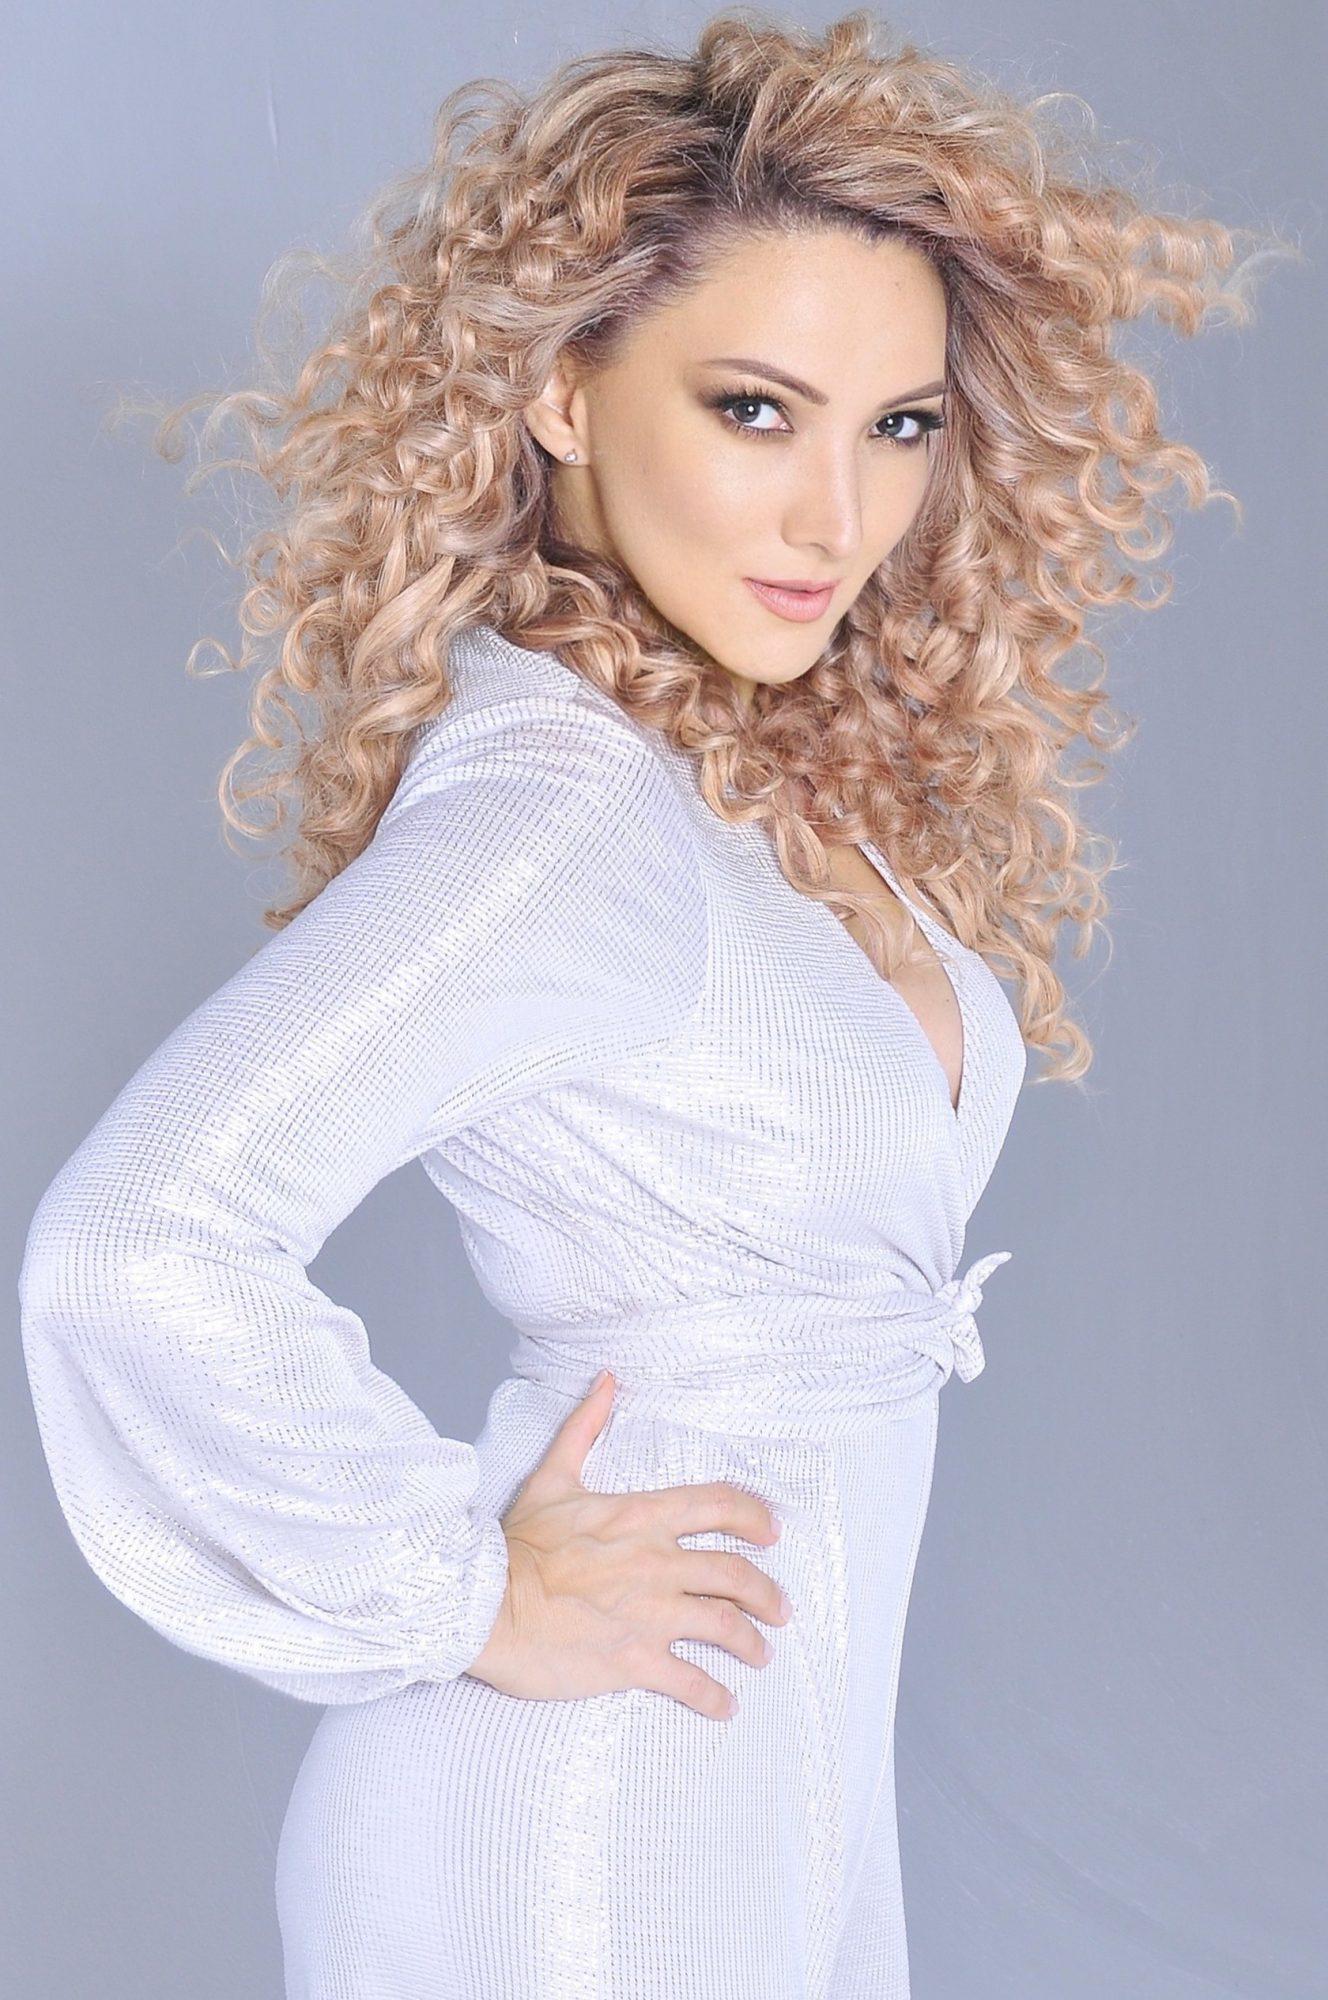 Poderosas 2021 – Madrinas y ahijadas – Erika Ender (madrina) - Evaluna Montaner (Ahijada)